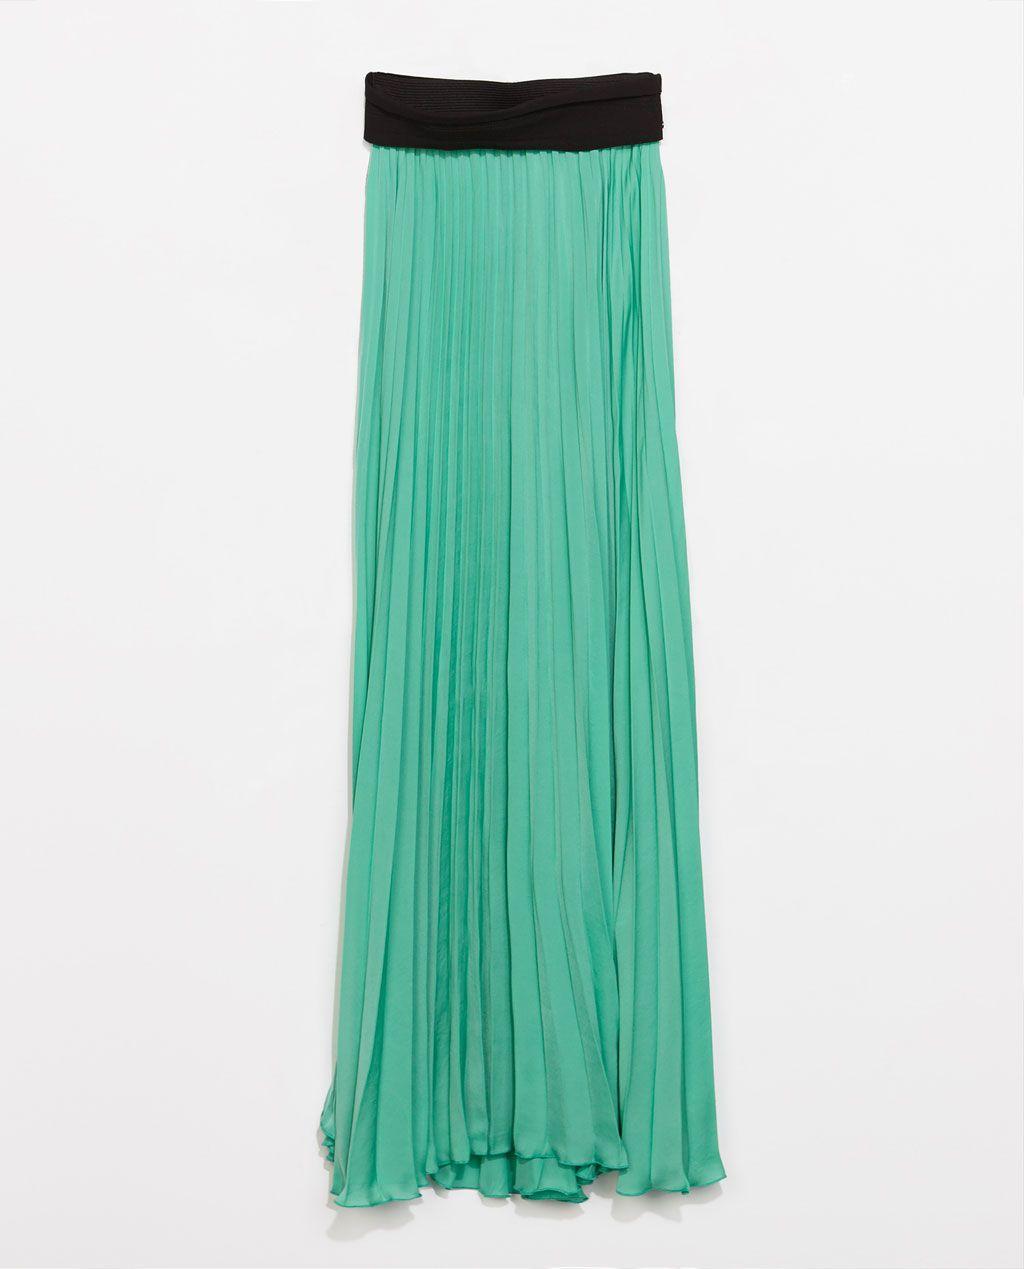 falda  larga  plisada  tableada  verdeagua  · ZARA · 49 7407a88de67c